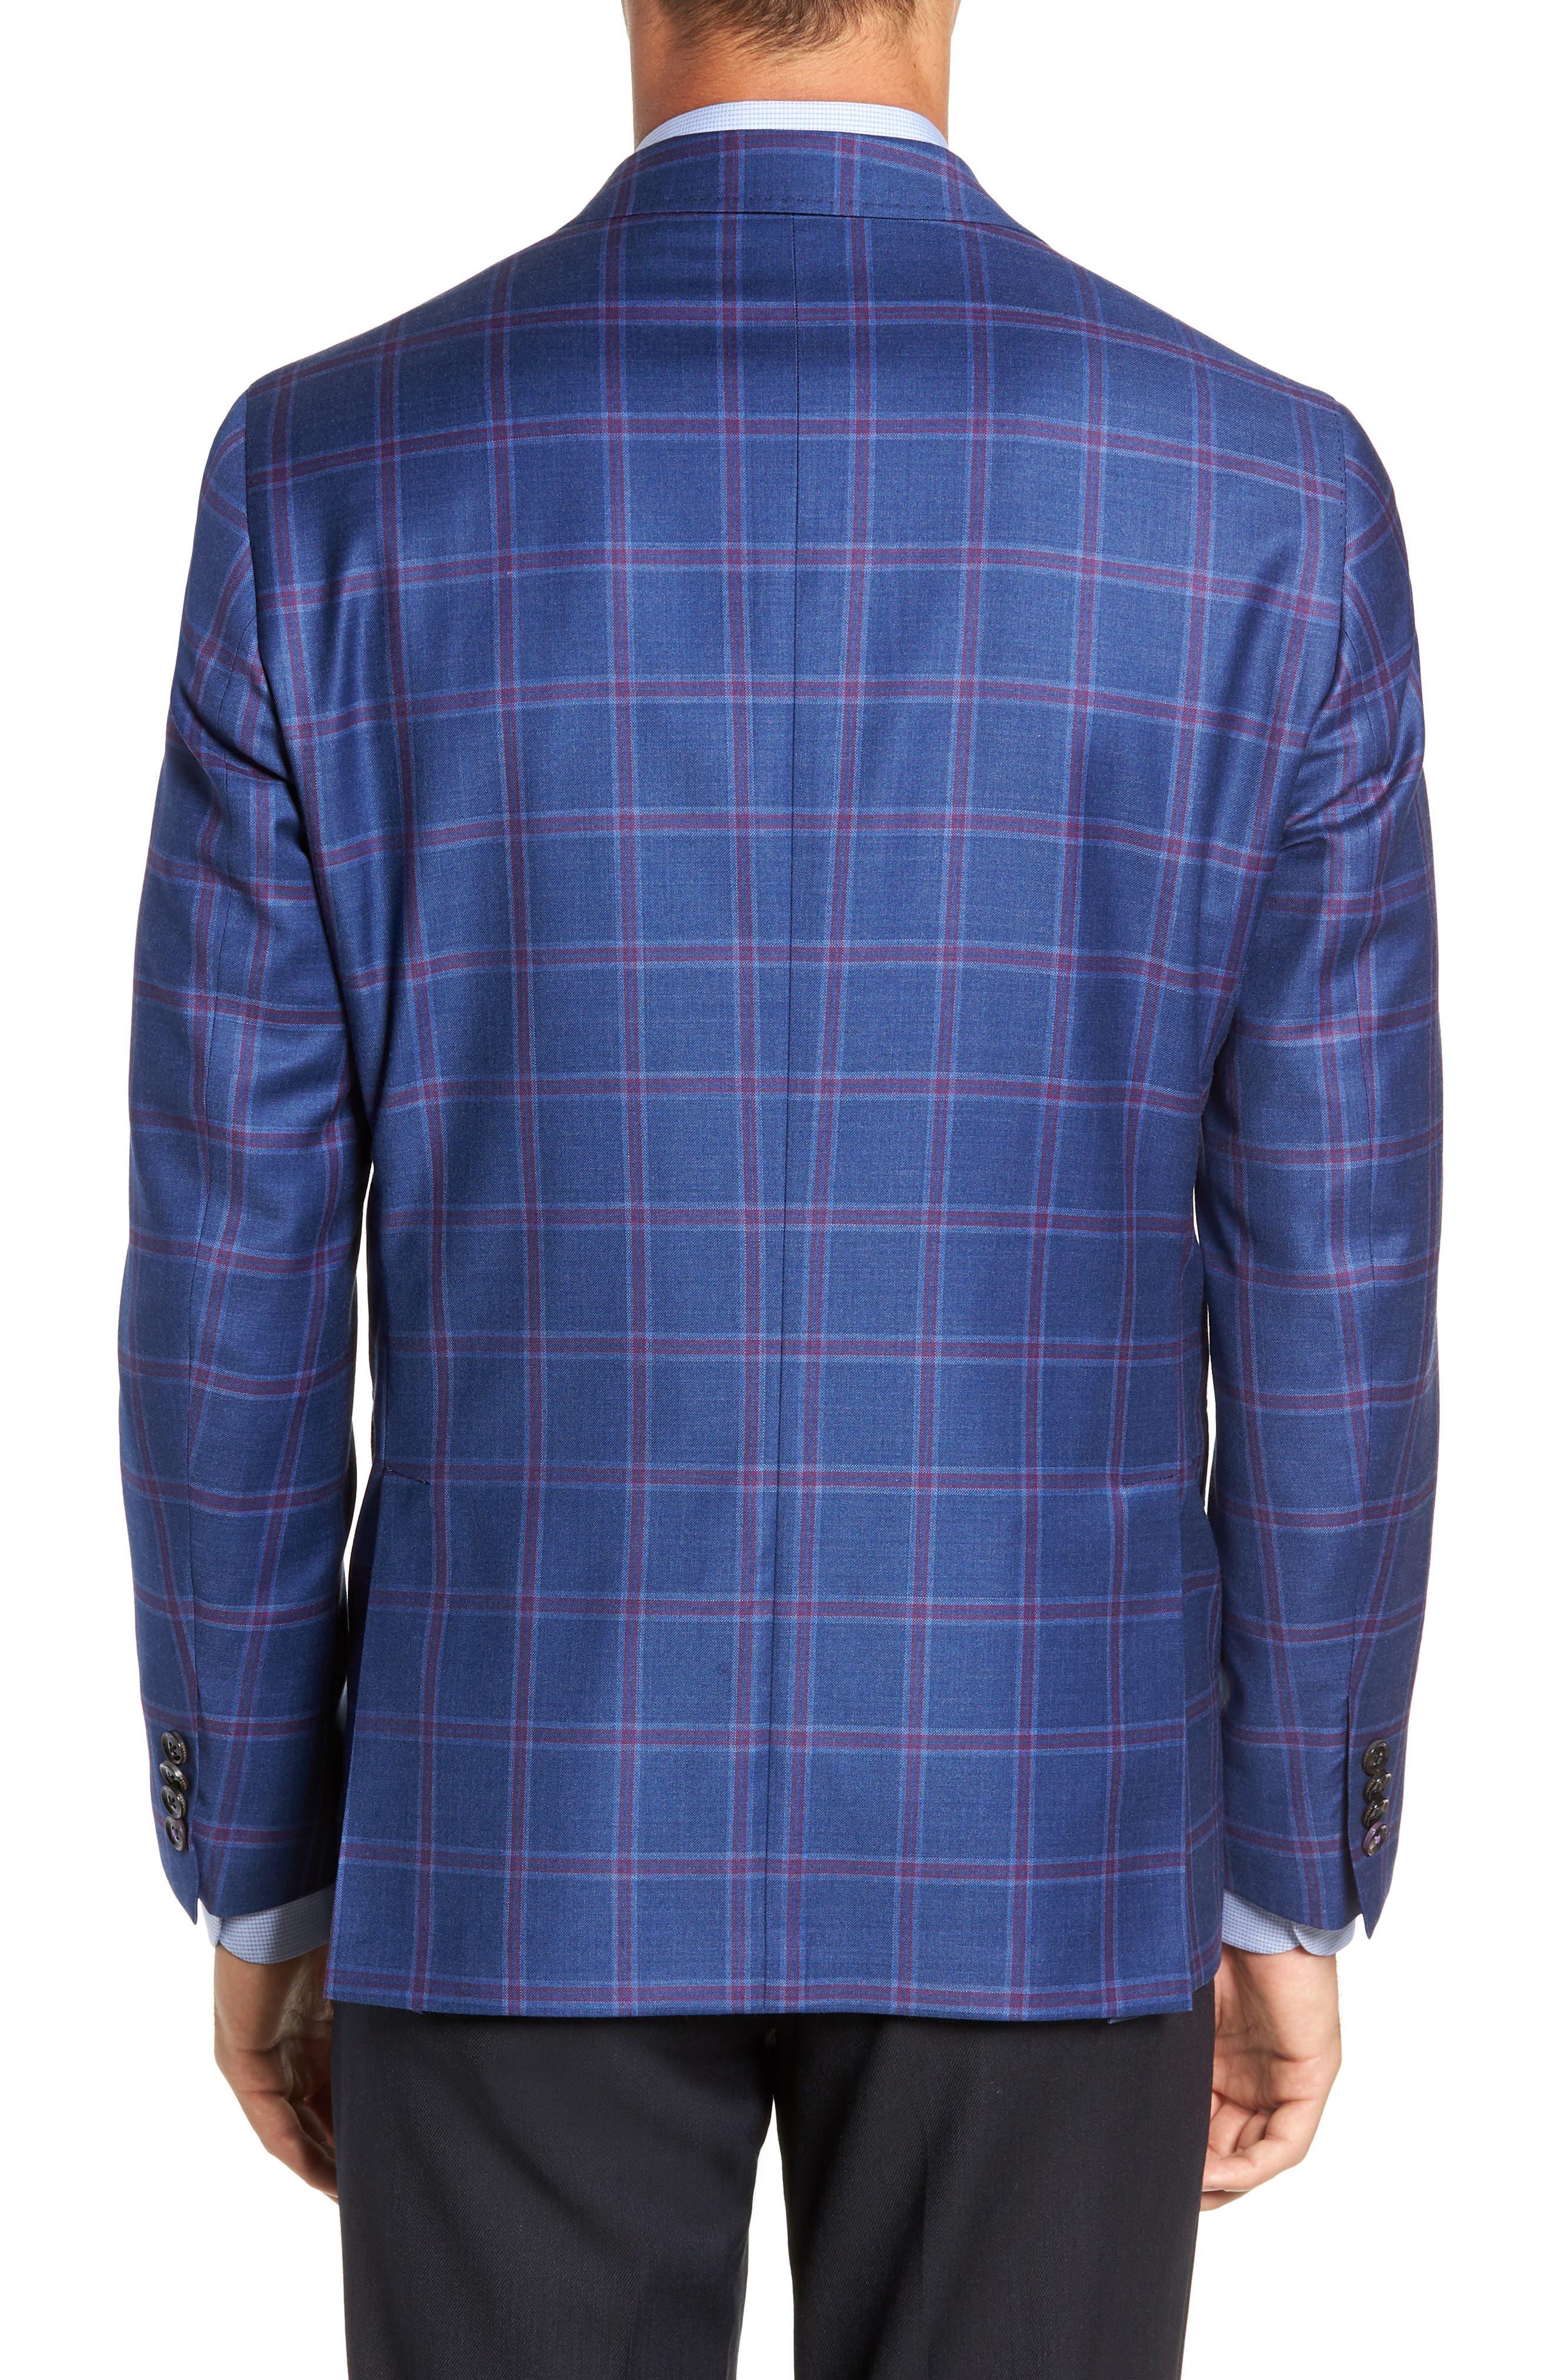 TED BAKER LONDON, Konan Trim Fit Wool Sport Coat, Alternate thumbnail 2, color, BLUE